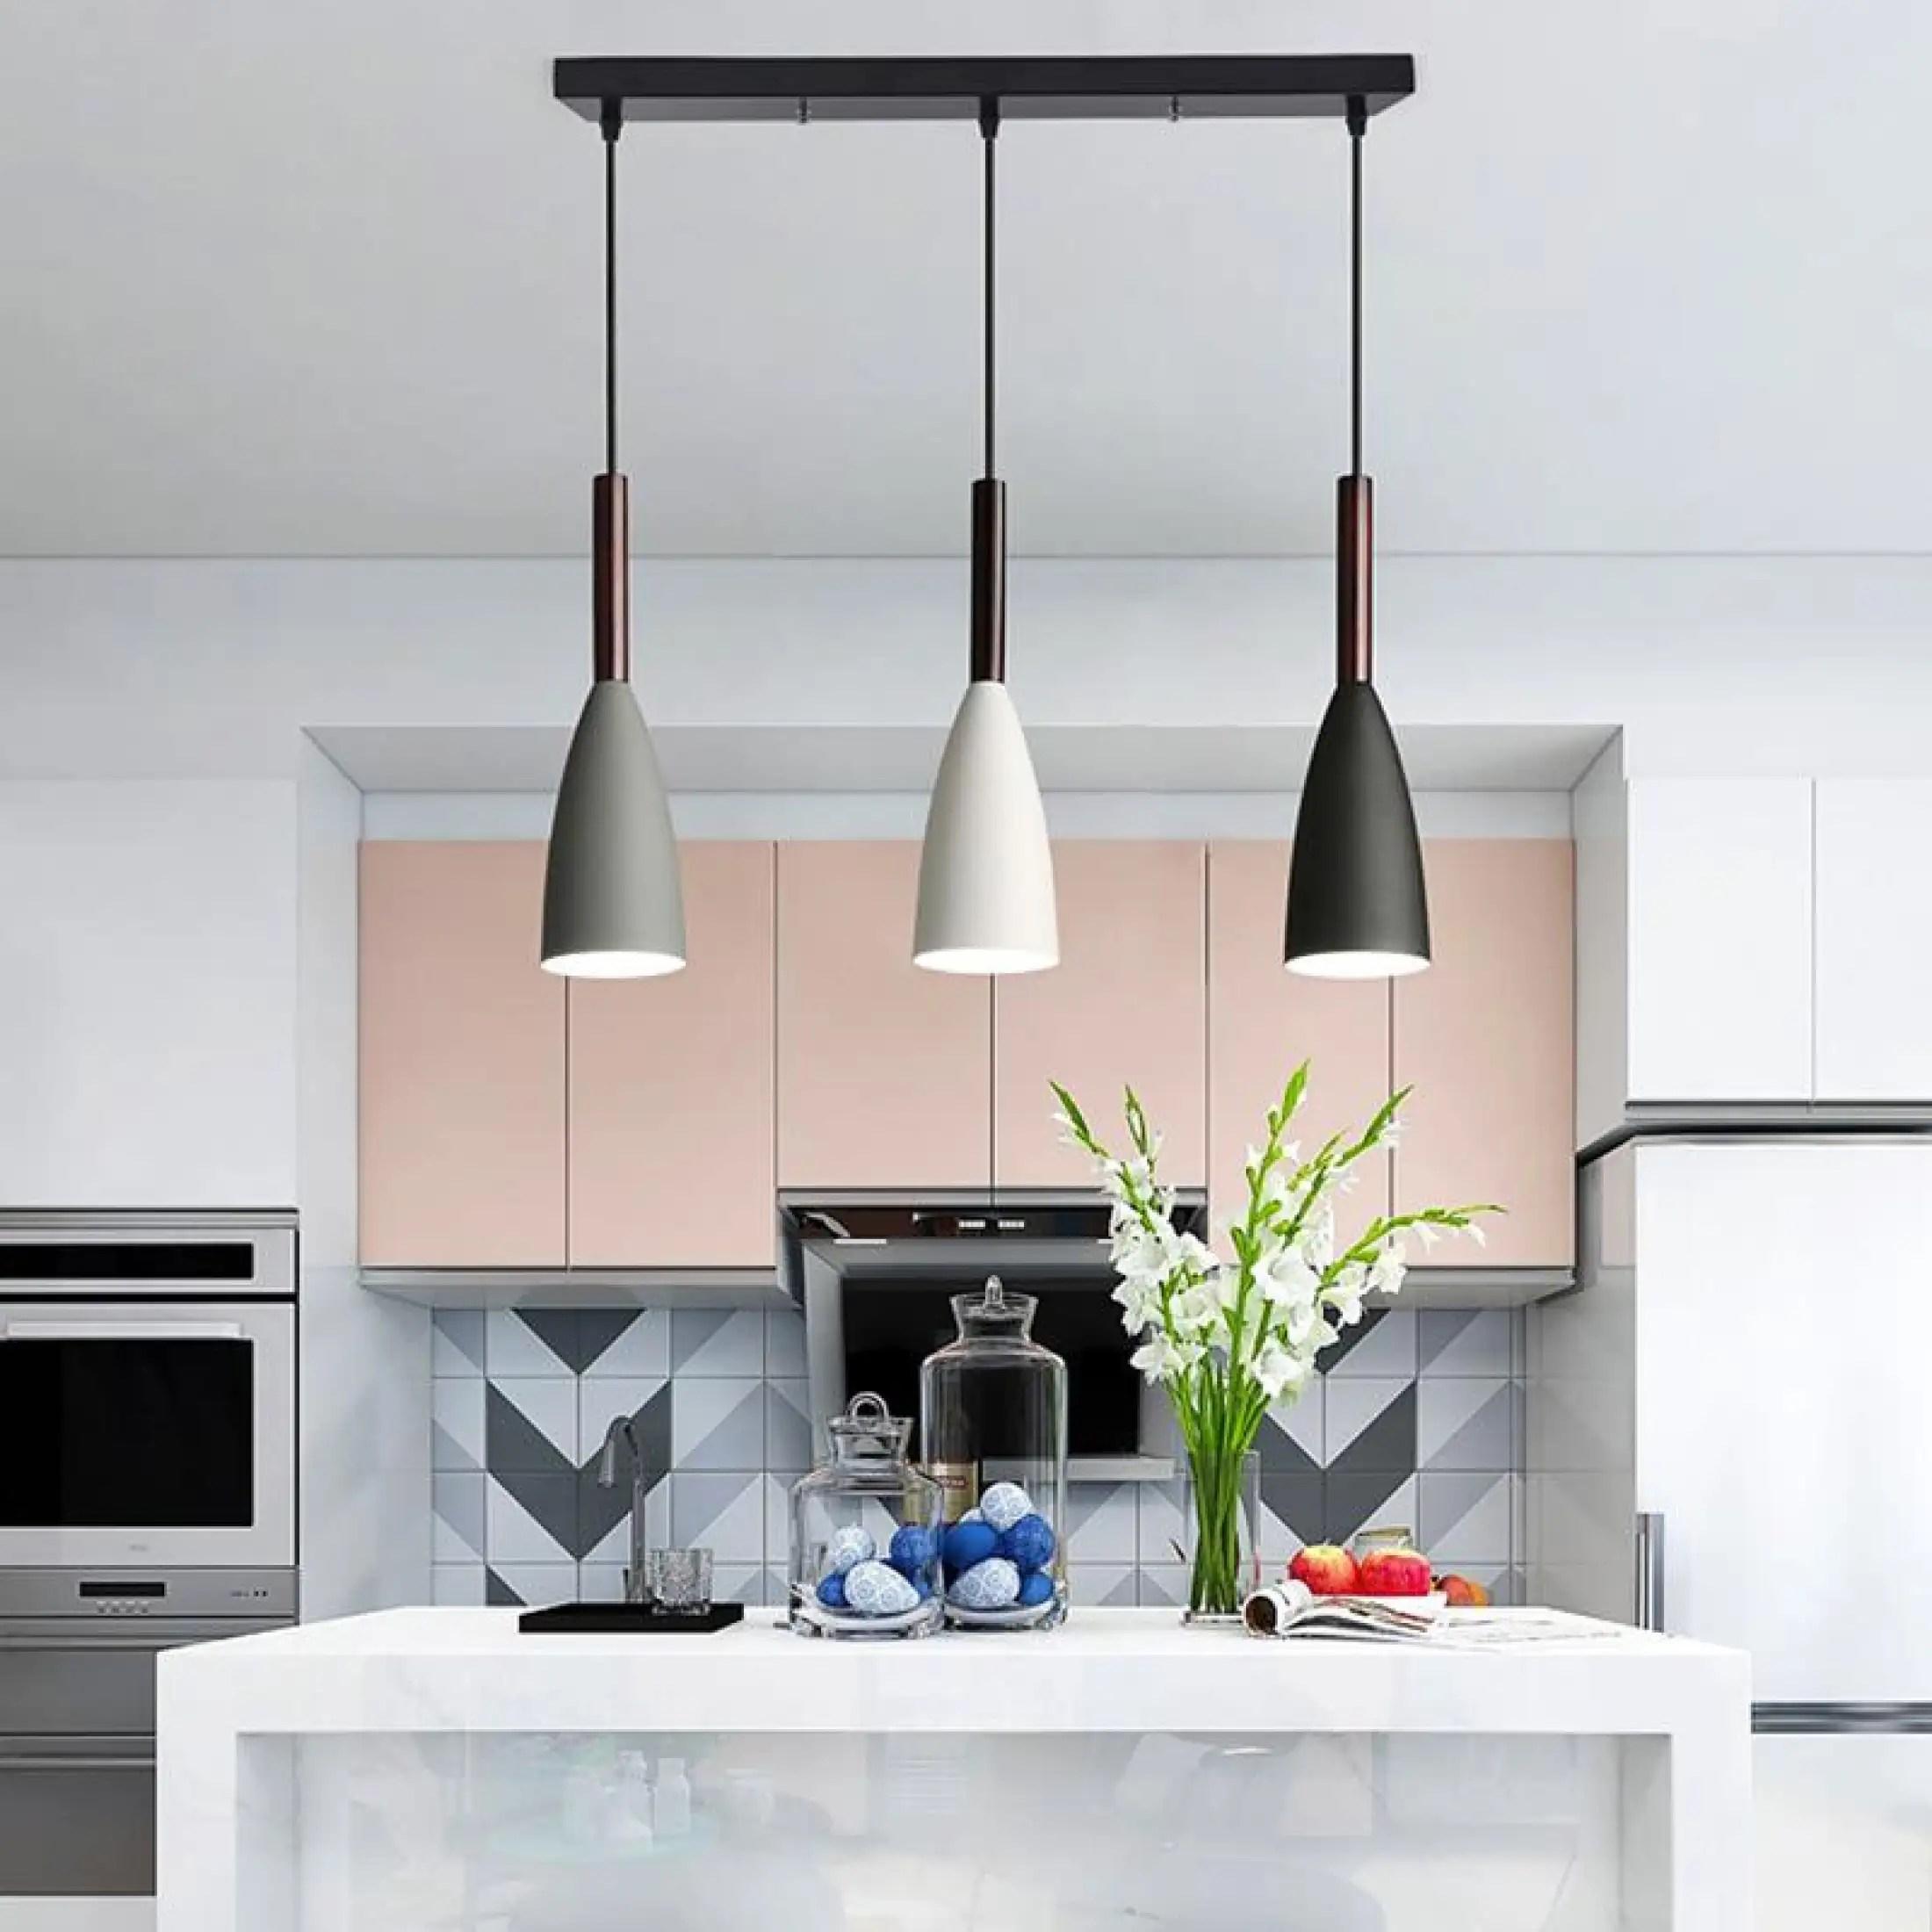 modern 3 pendant lighting nordic minimalist pendant lights dining table kitchen island hanging lamps dining room lights e27 free shiping